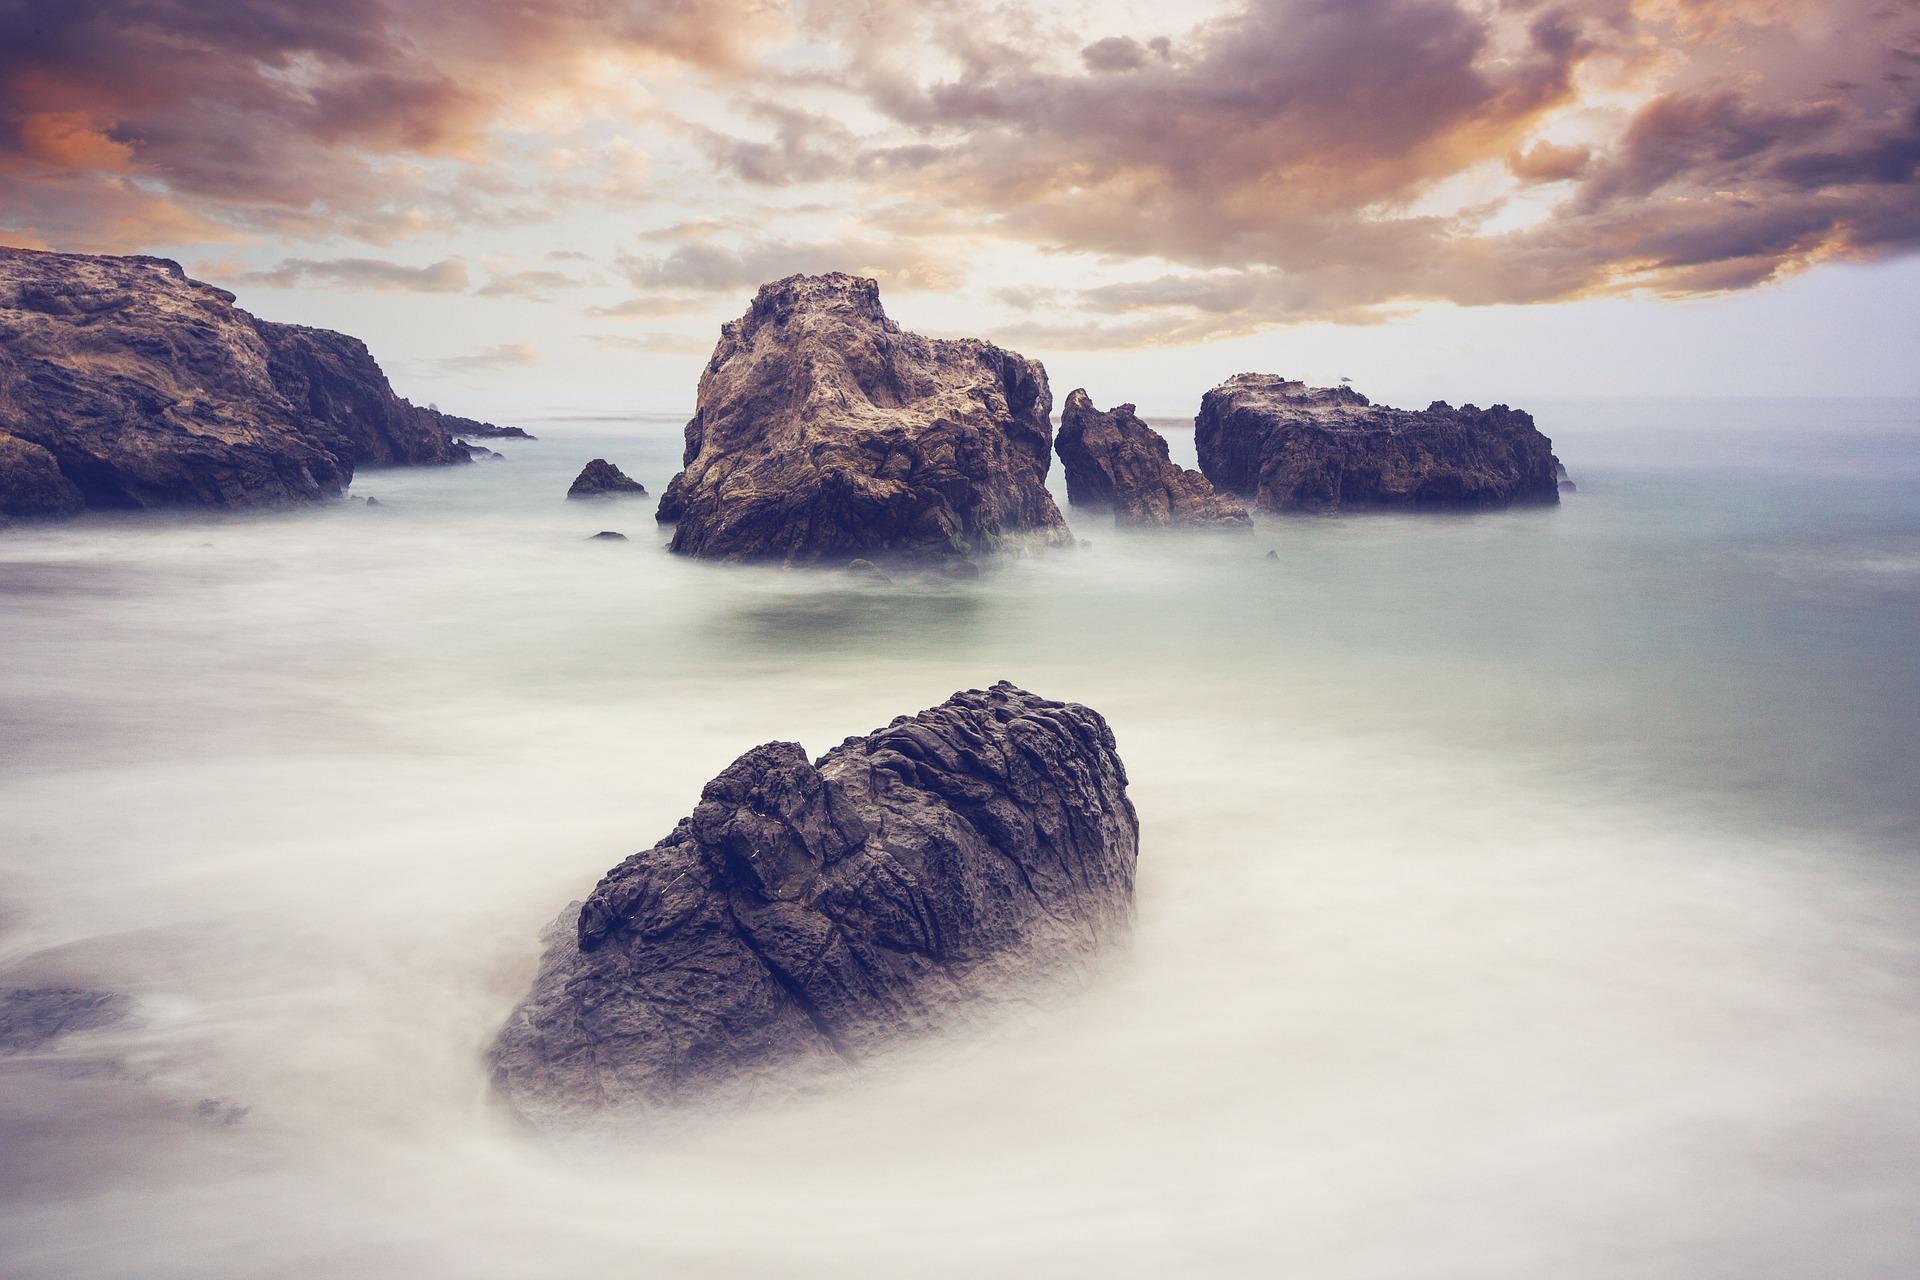 Rocas, nebbia, Ocean, calma, nuvole - Sfondi HD - Professor-falken.com